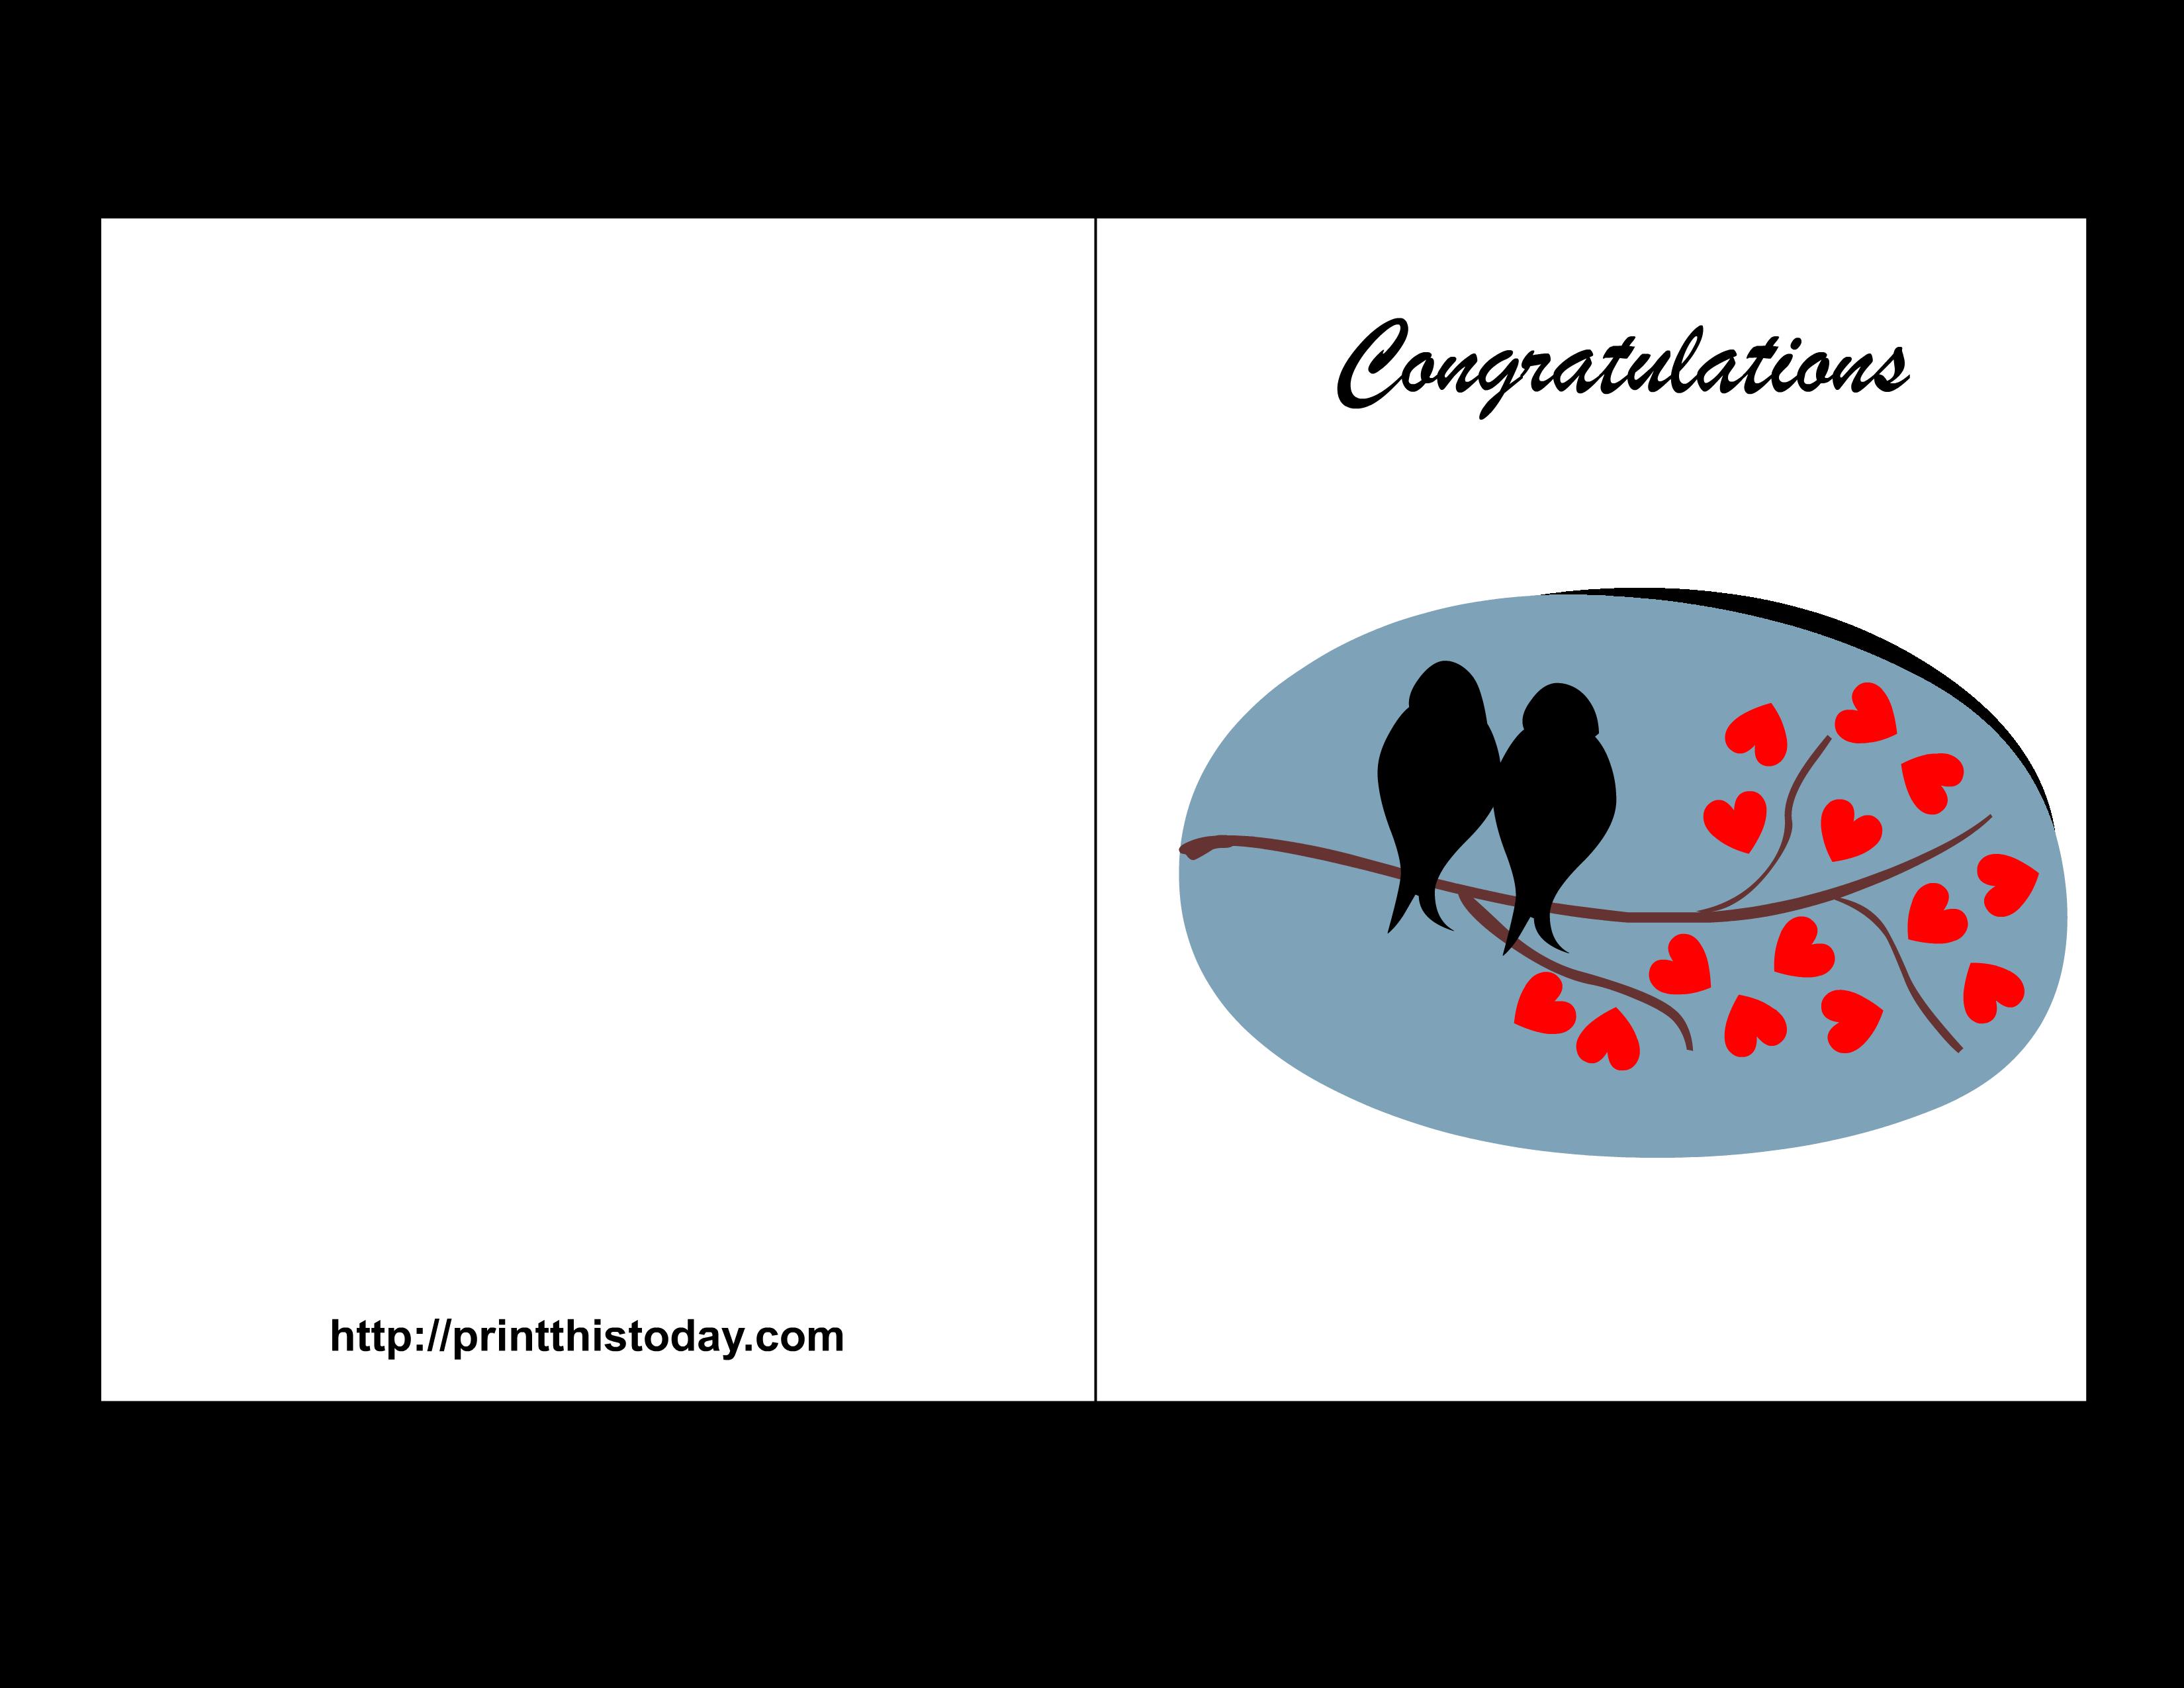 Congratulations clipart student. Free printable baby congratulation